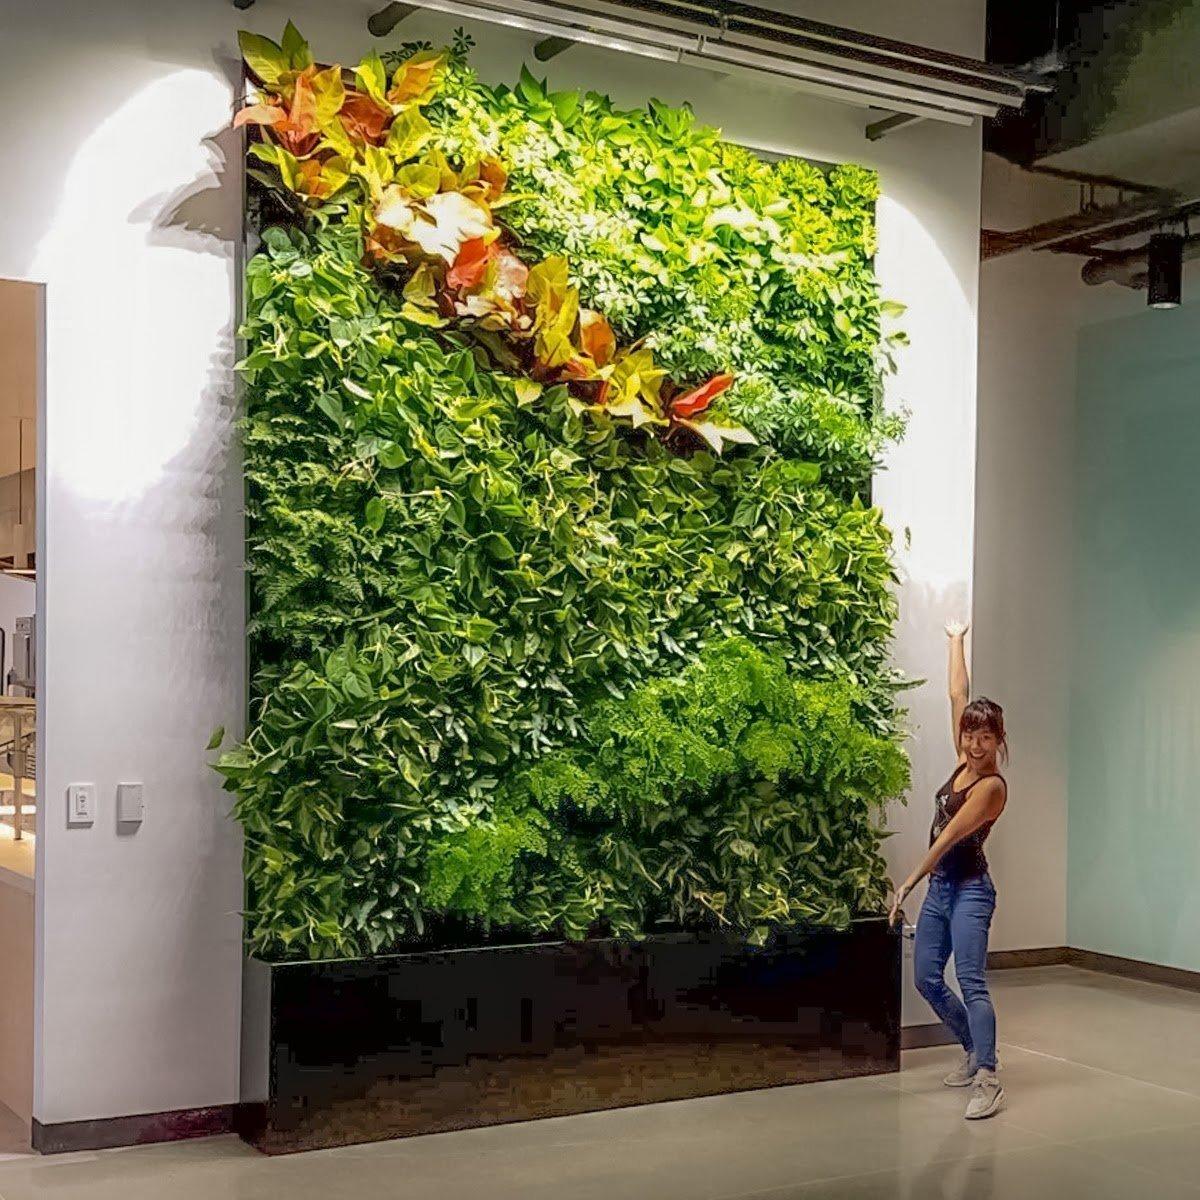 Florafelt Pockets Vertical Garden Installation by Chris Bribach Plants On Walls, San Francisco